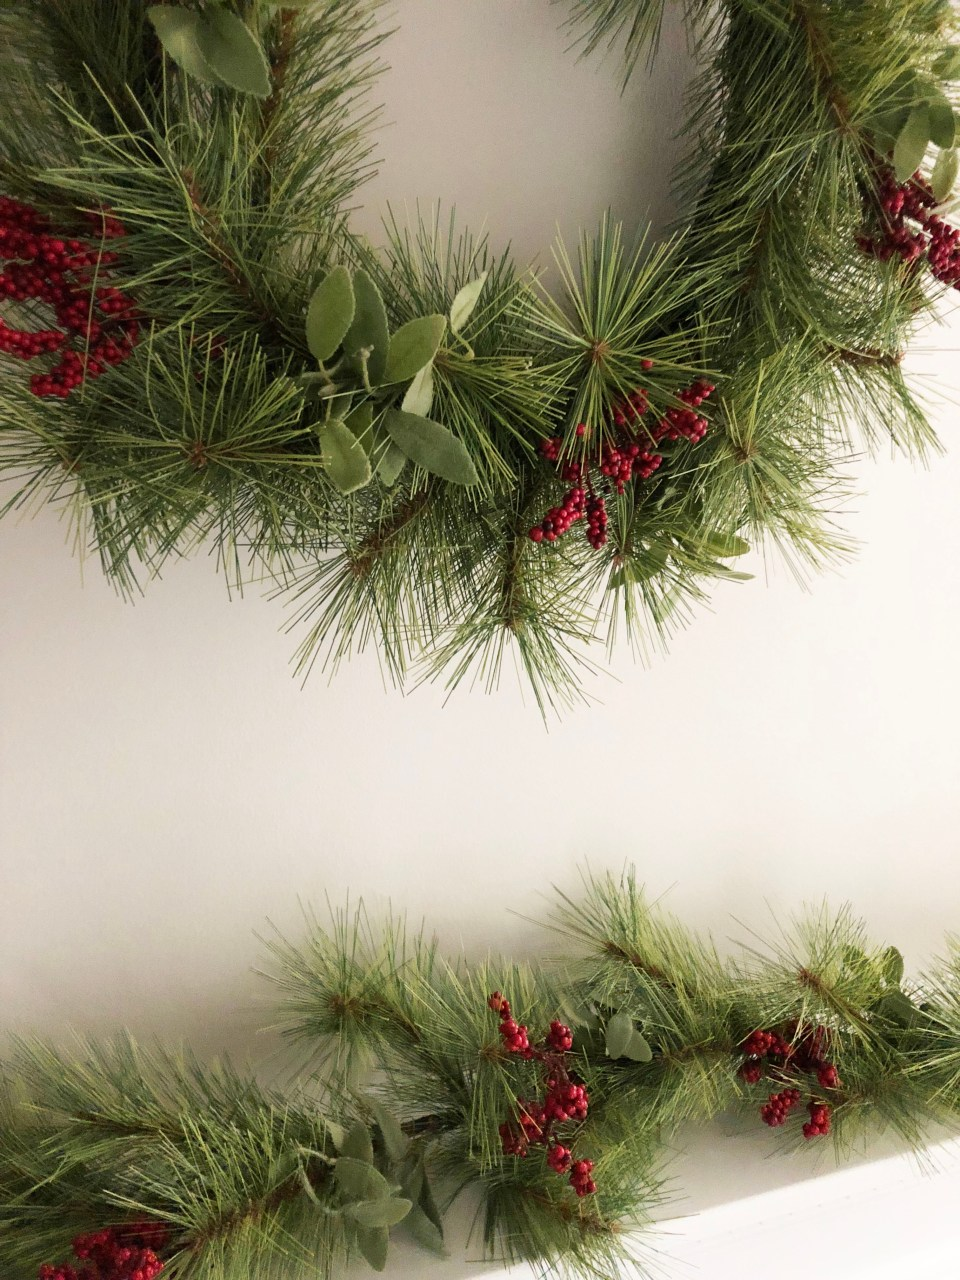 Mantel Garland and Wreath